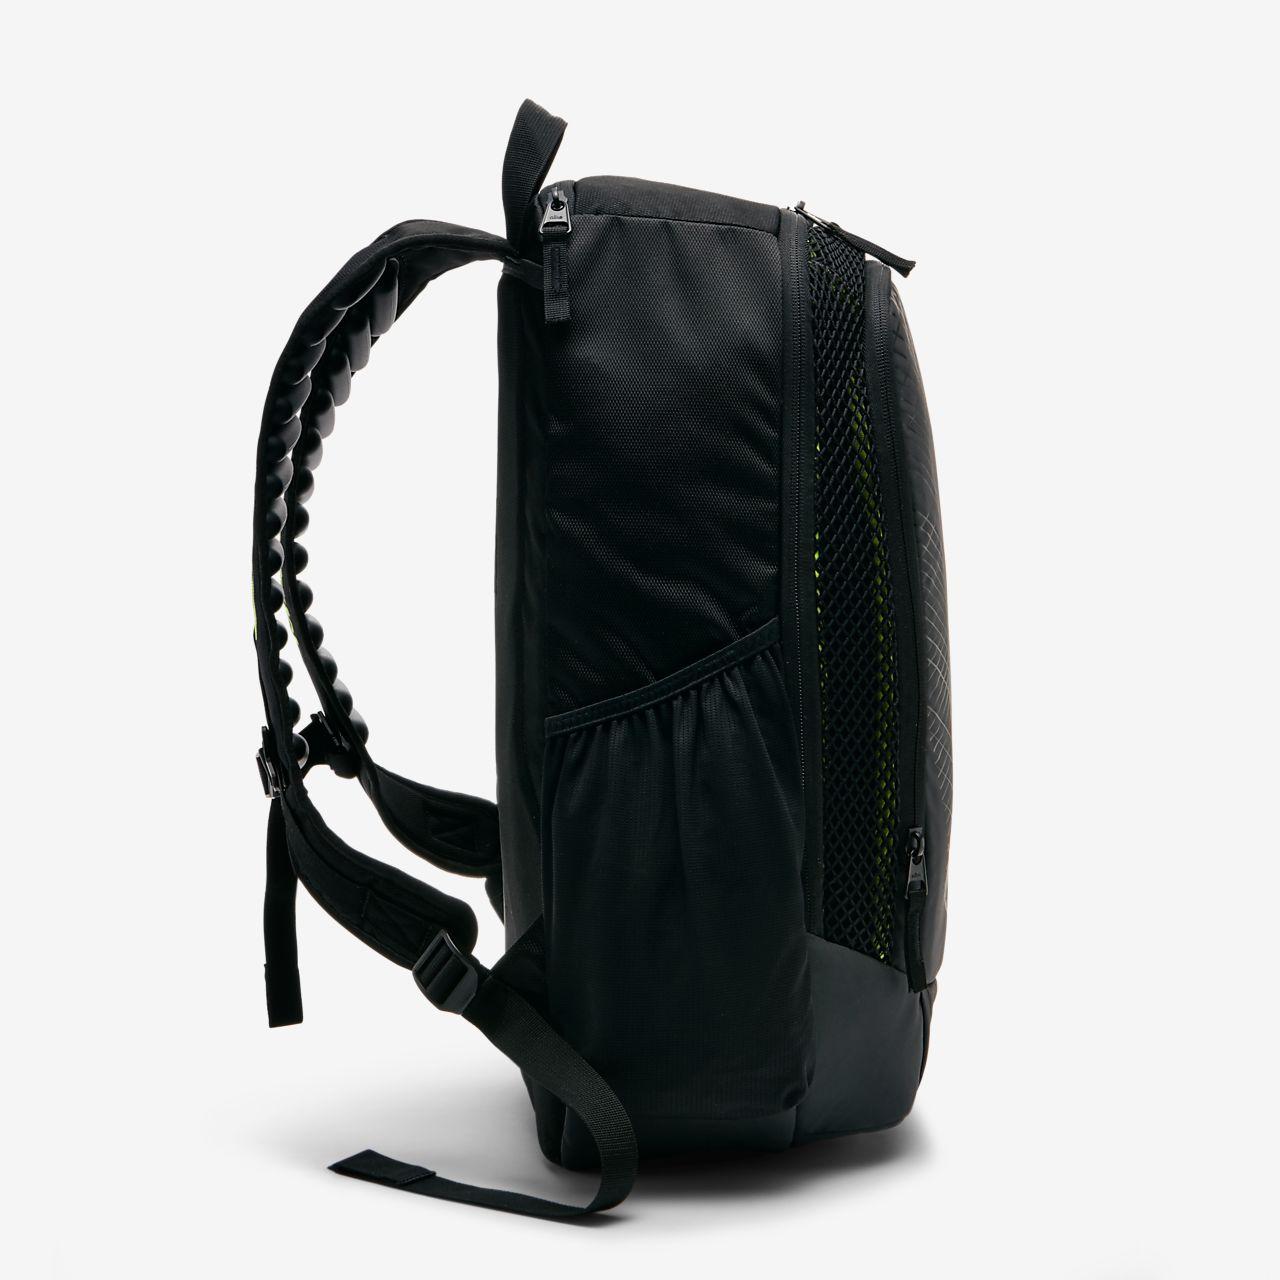 524805c68d Low Resolution Nike Vapor Speed Training Backpack Nike Vapor Speed Training  Backpack